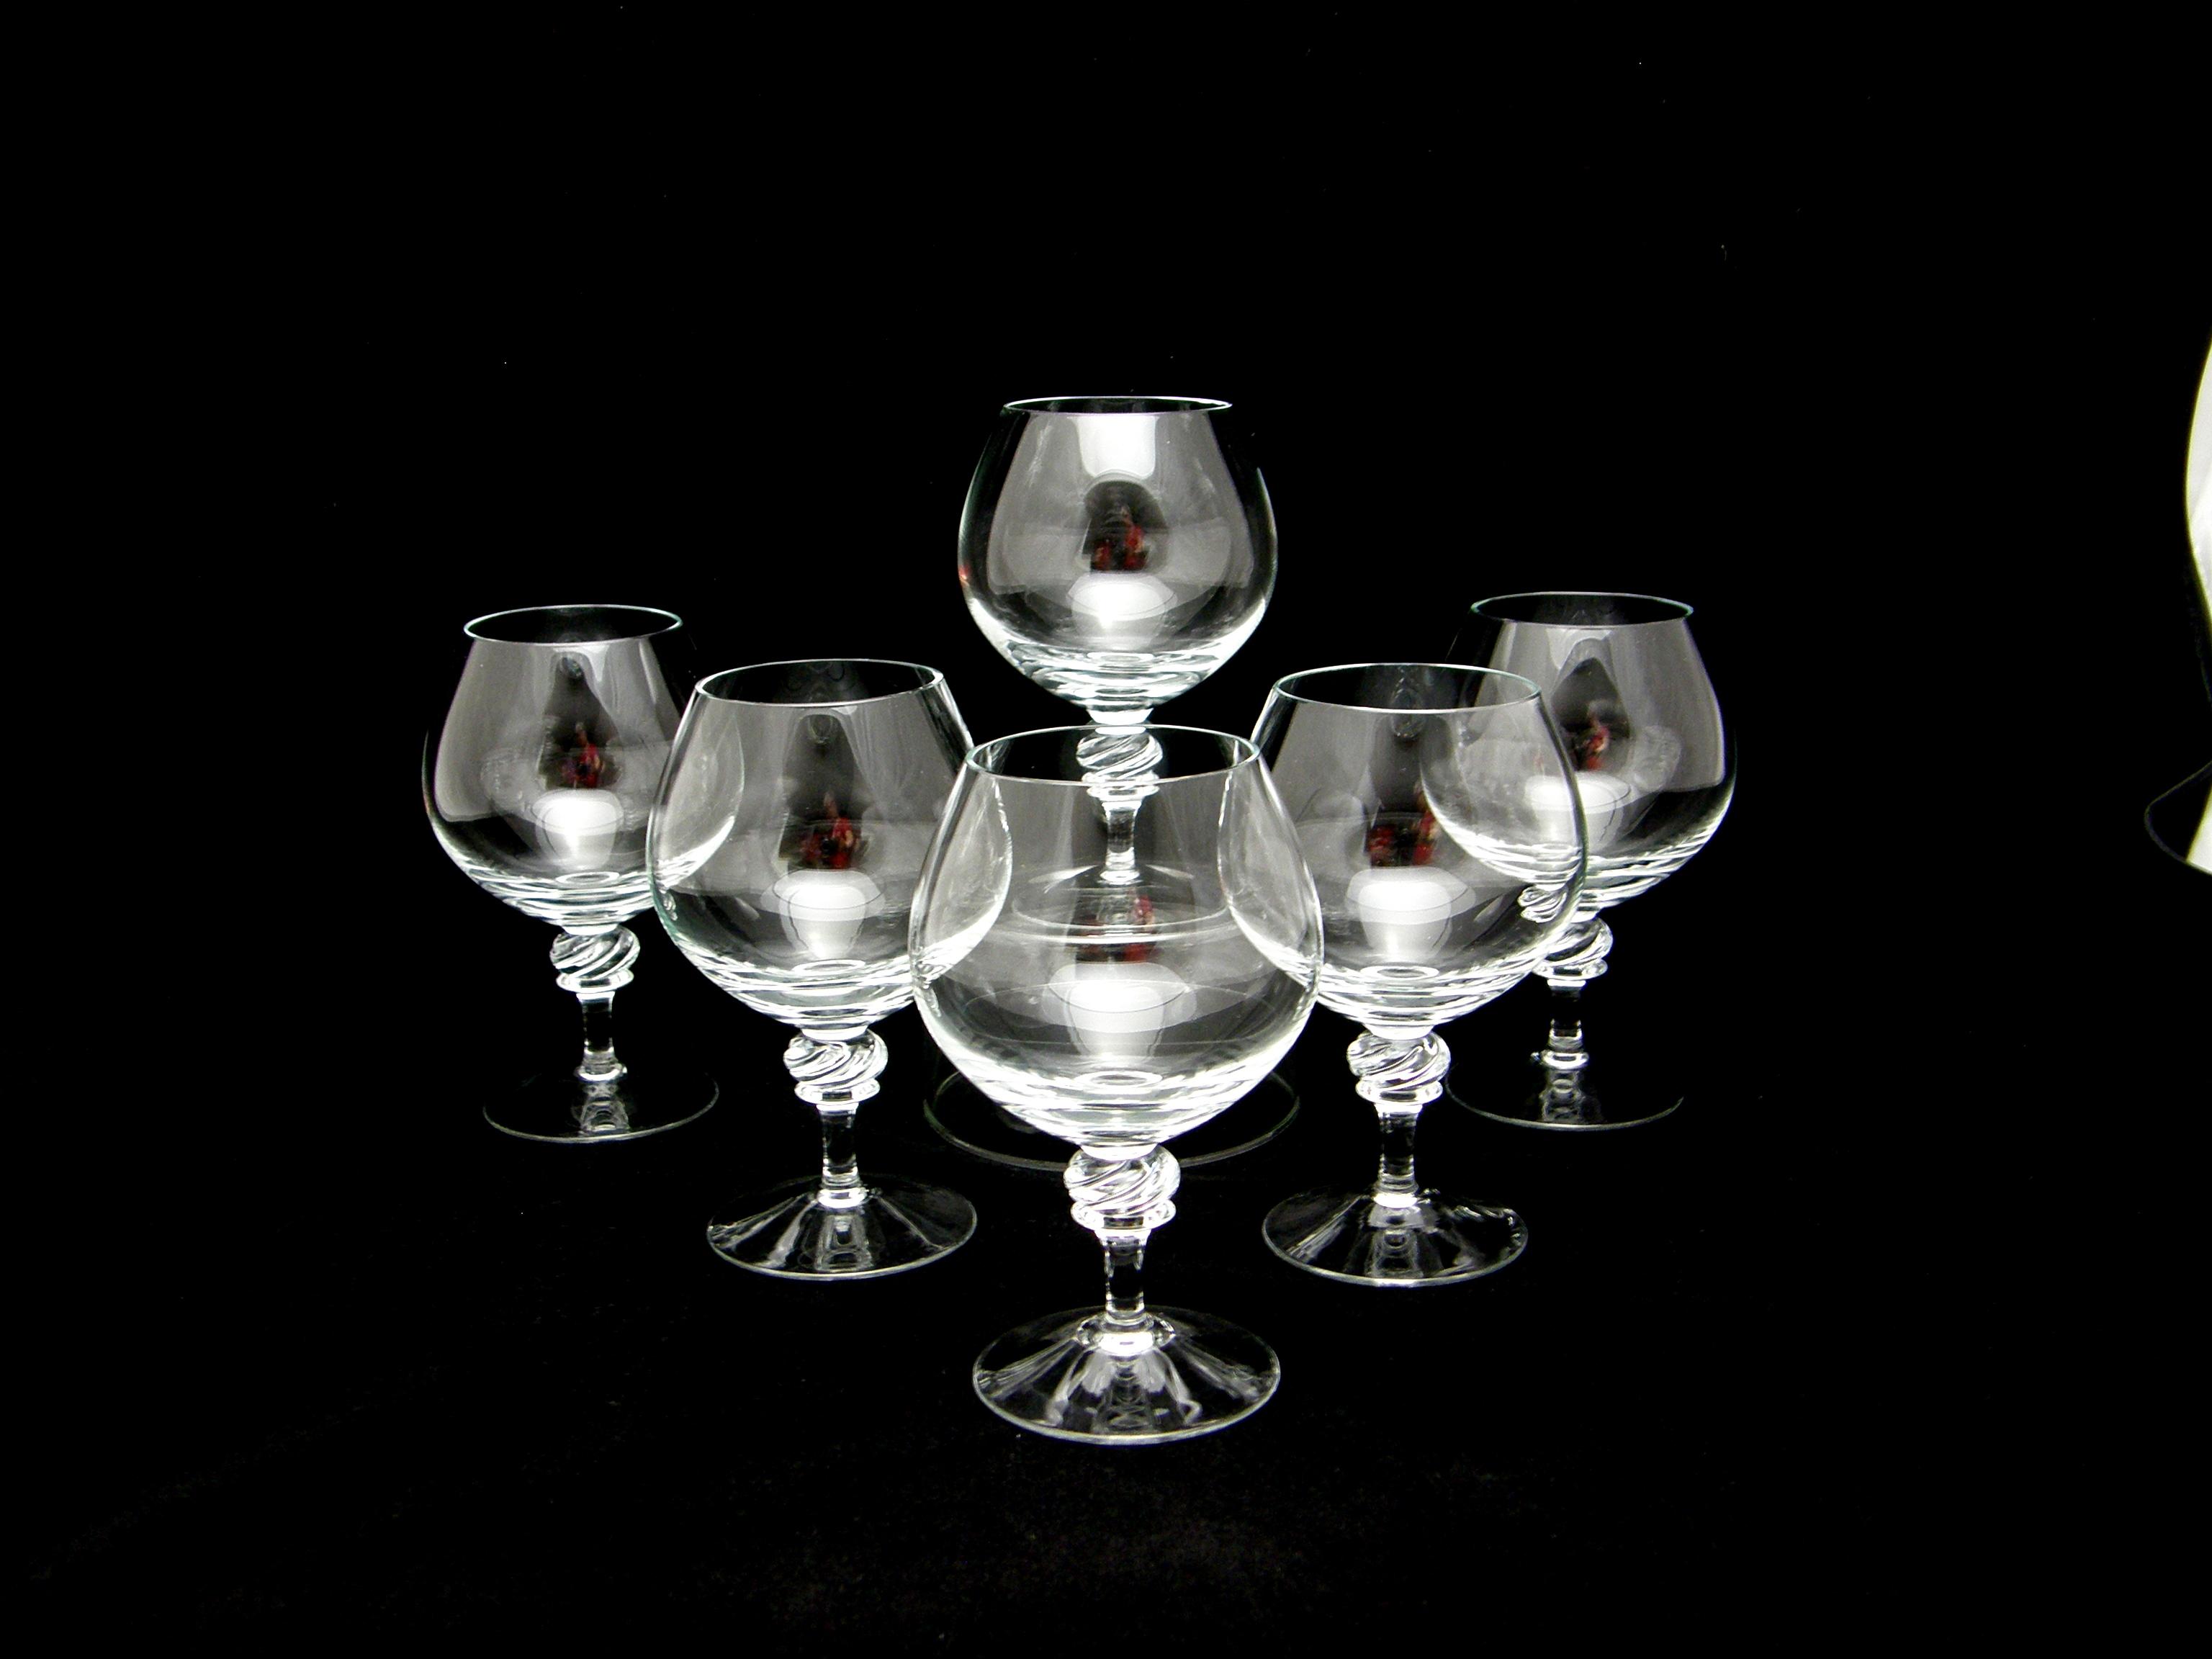 cognacglas 6 st nicole wmf jolisas finska glas och. Black Bedroom Furniture Sets. Home Design Ideas